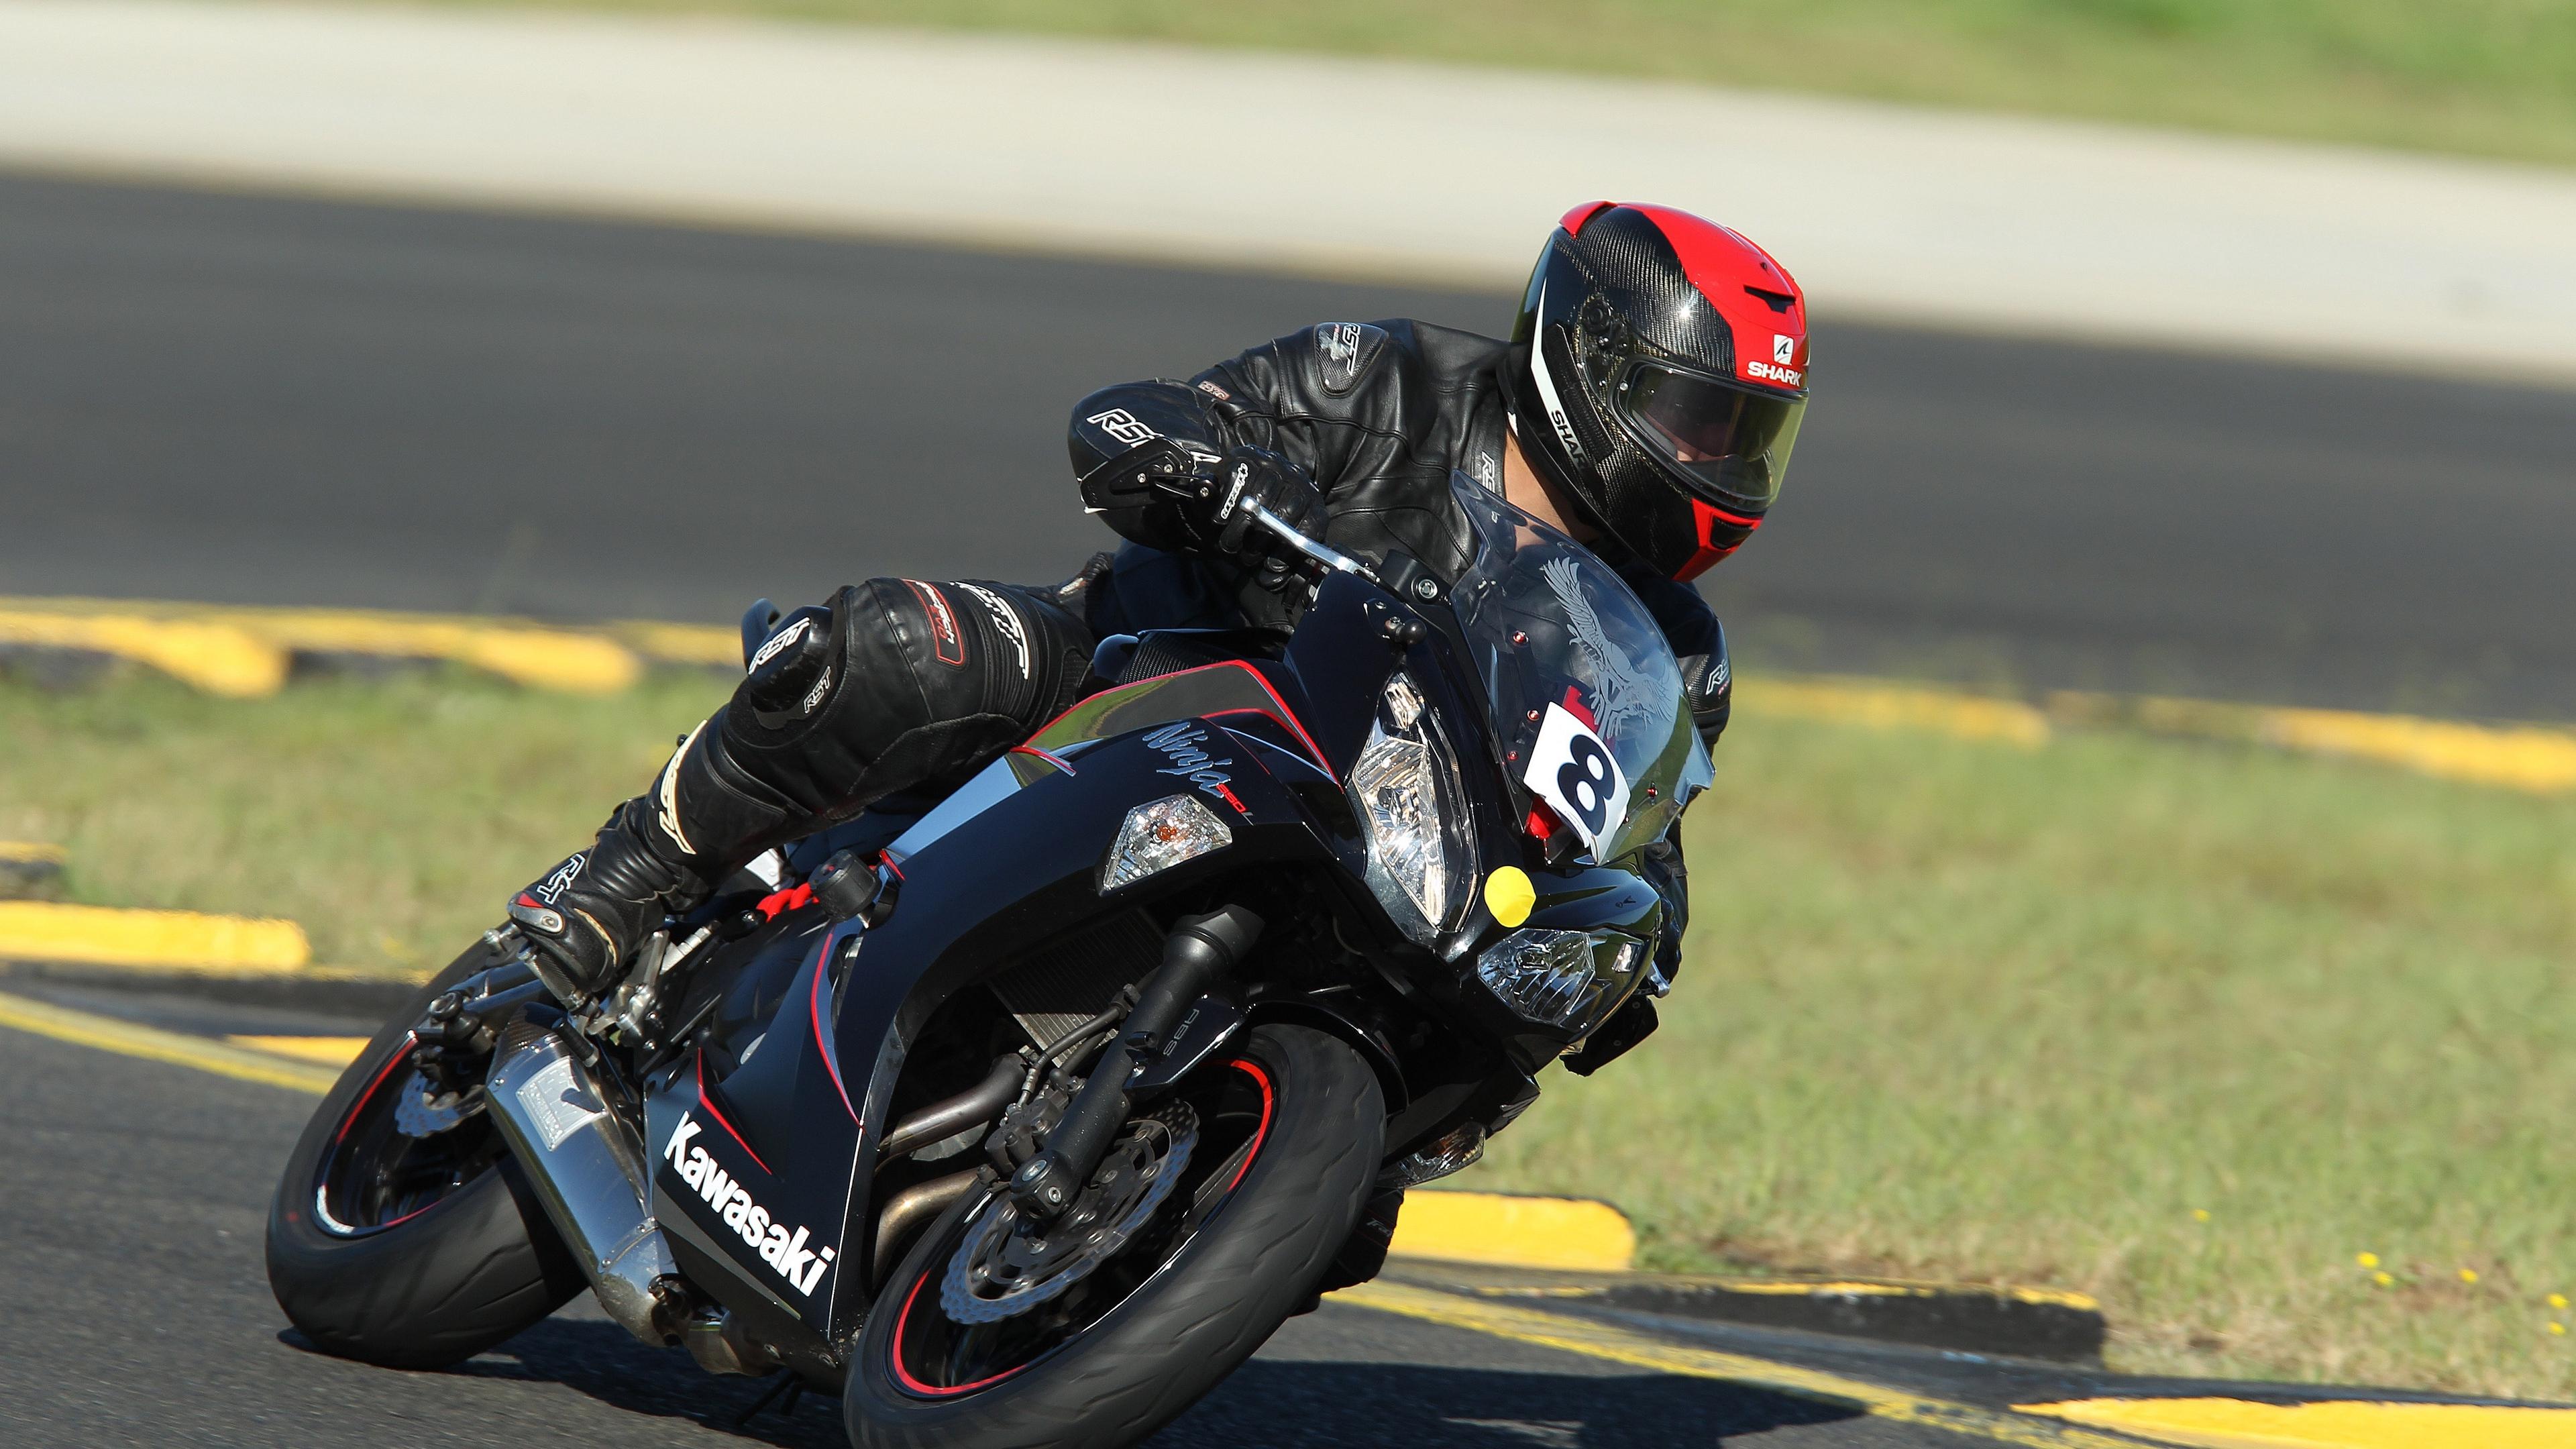 biker motorcycle racing 4k 1538943709 - biker, motorcycle, racing 4k - racing, Motorcycle, Biker